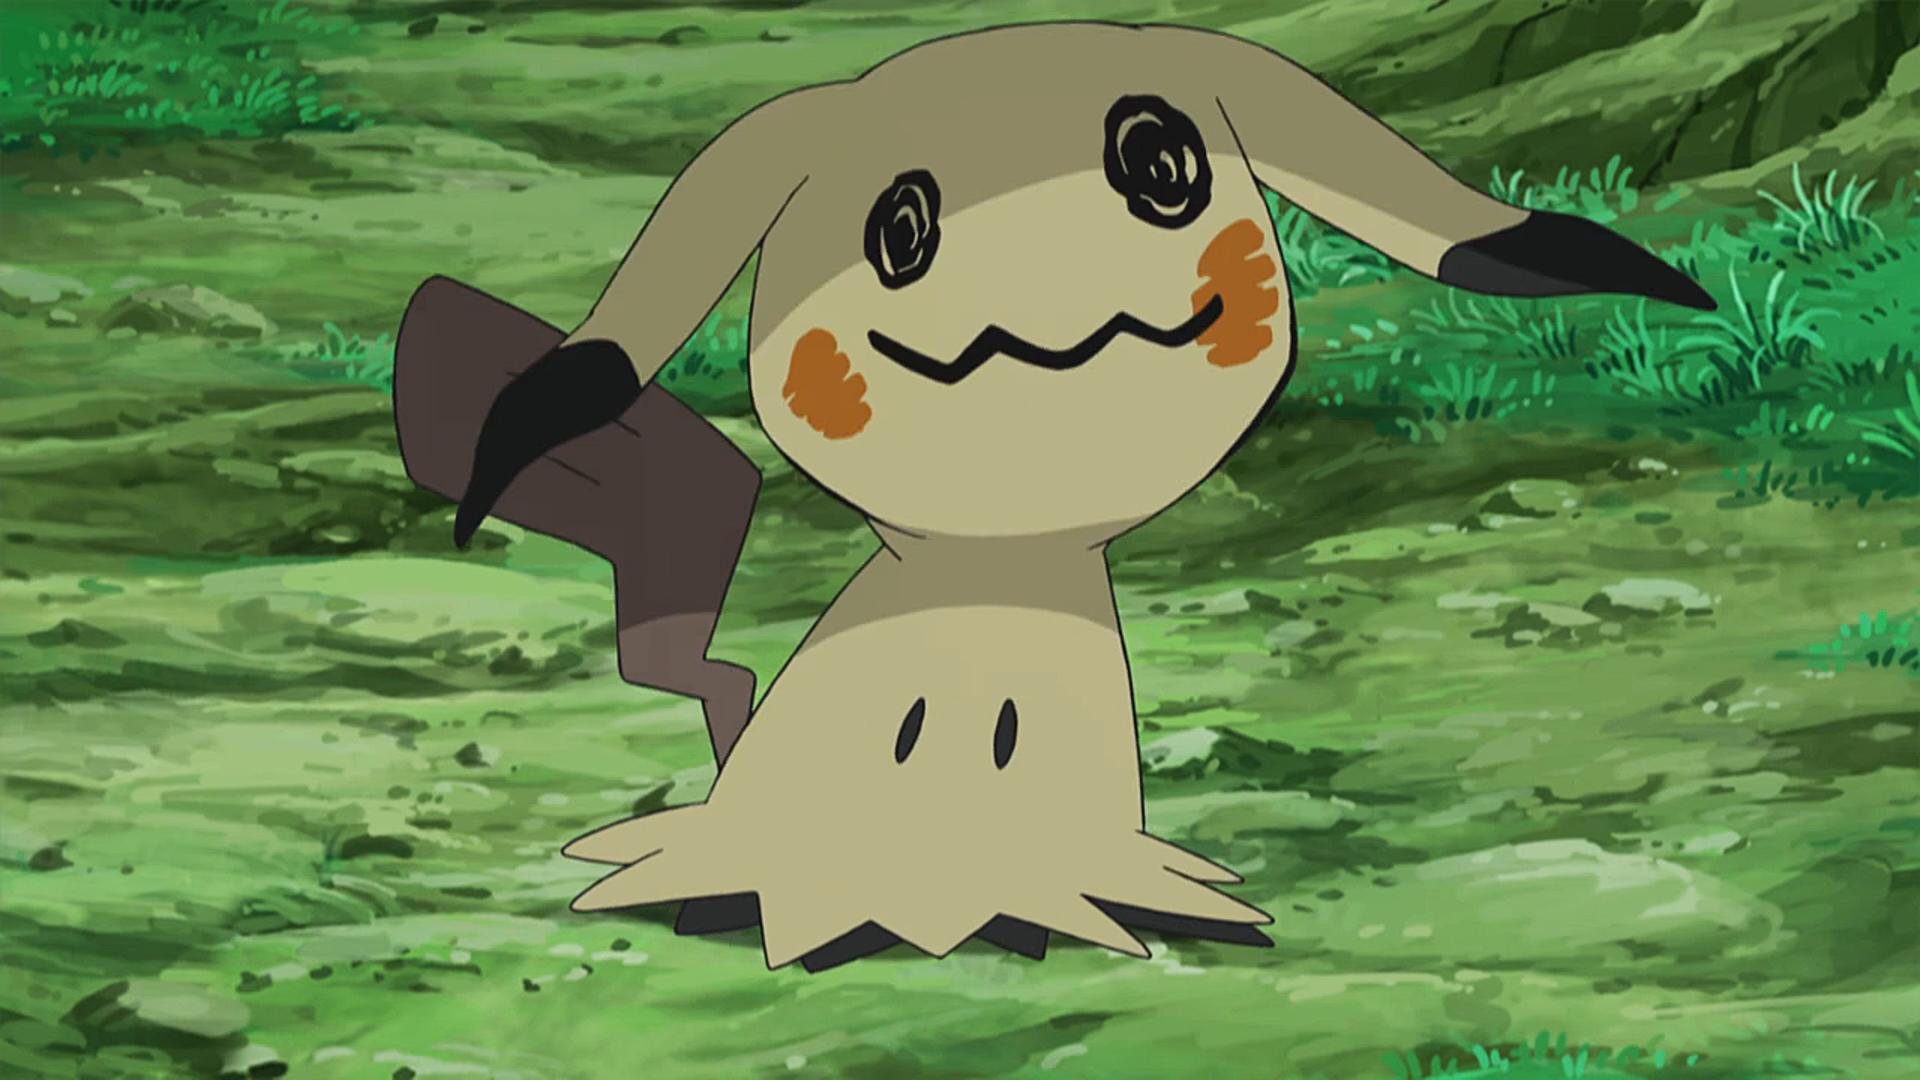 Pokémon Ultrasole E Ultraluna Mimikyu Avrà Una Mossa Z Esclusiva